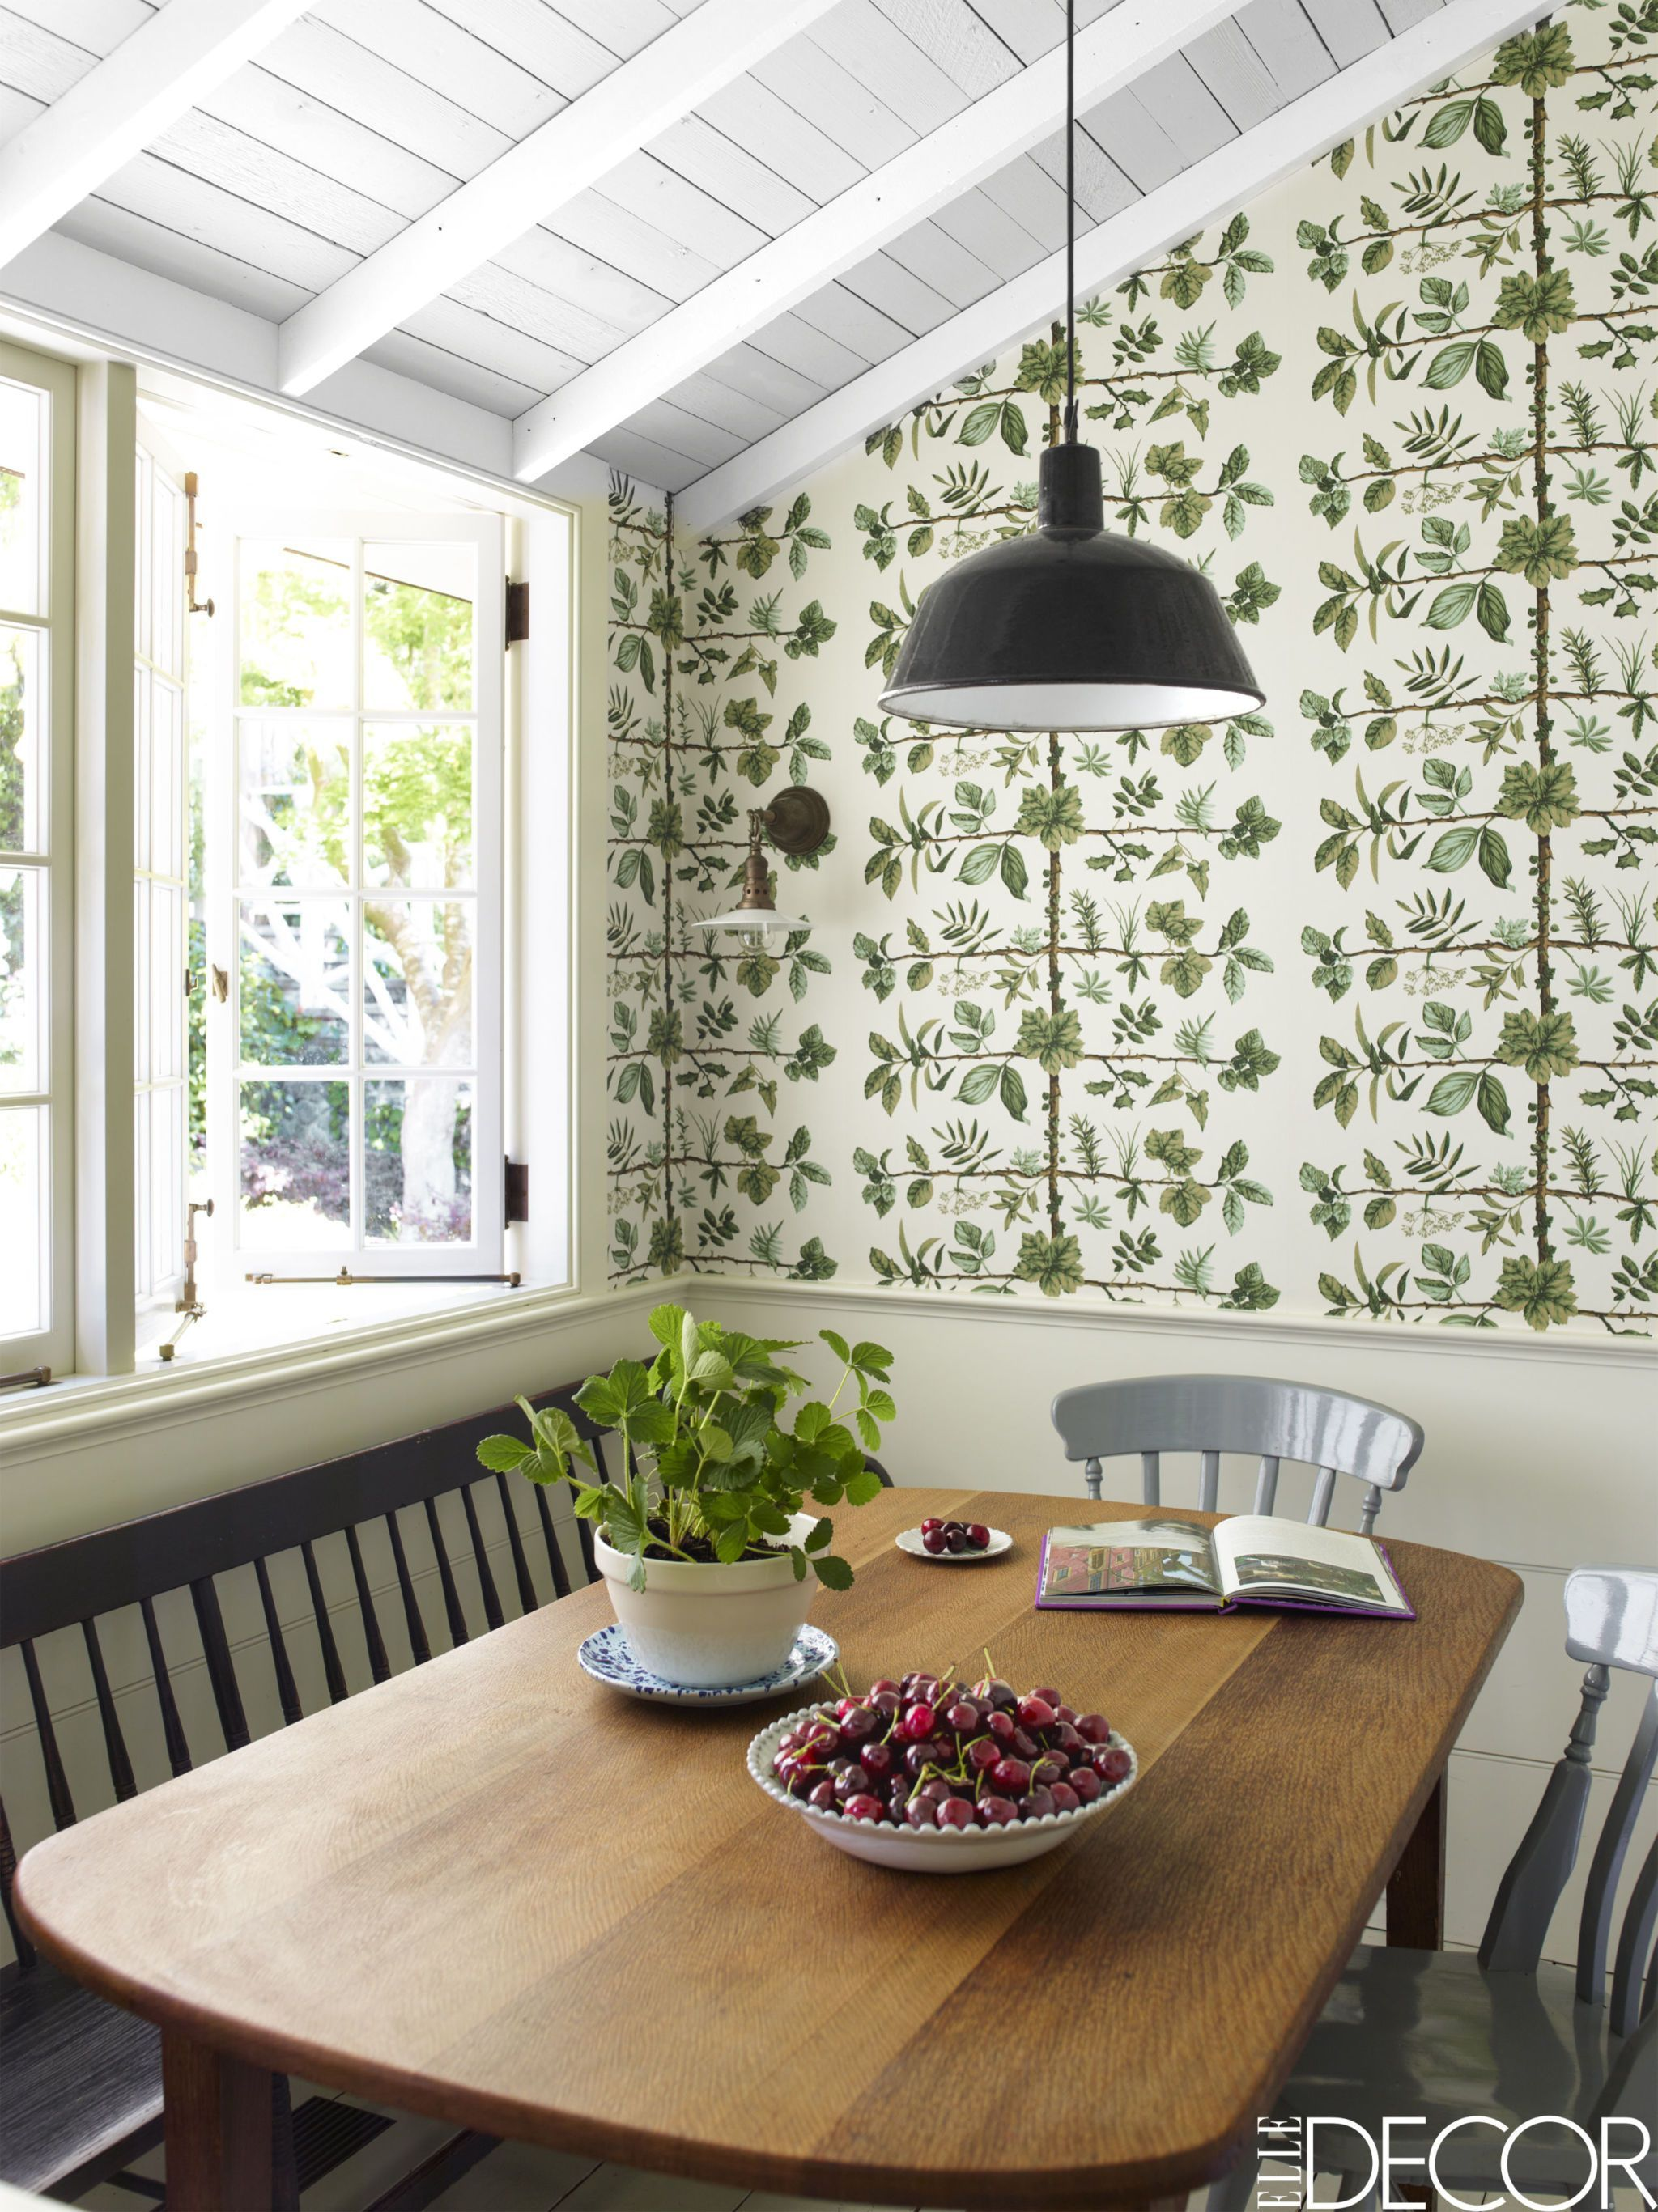 Rustic Design 32 Rustic Decor Ideas  Modern Rustic Style Rooms